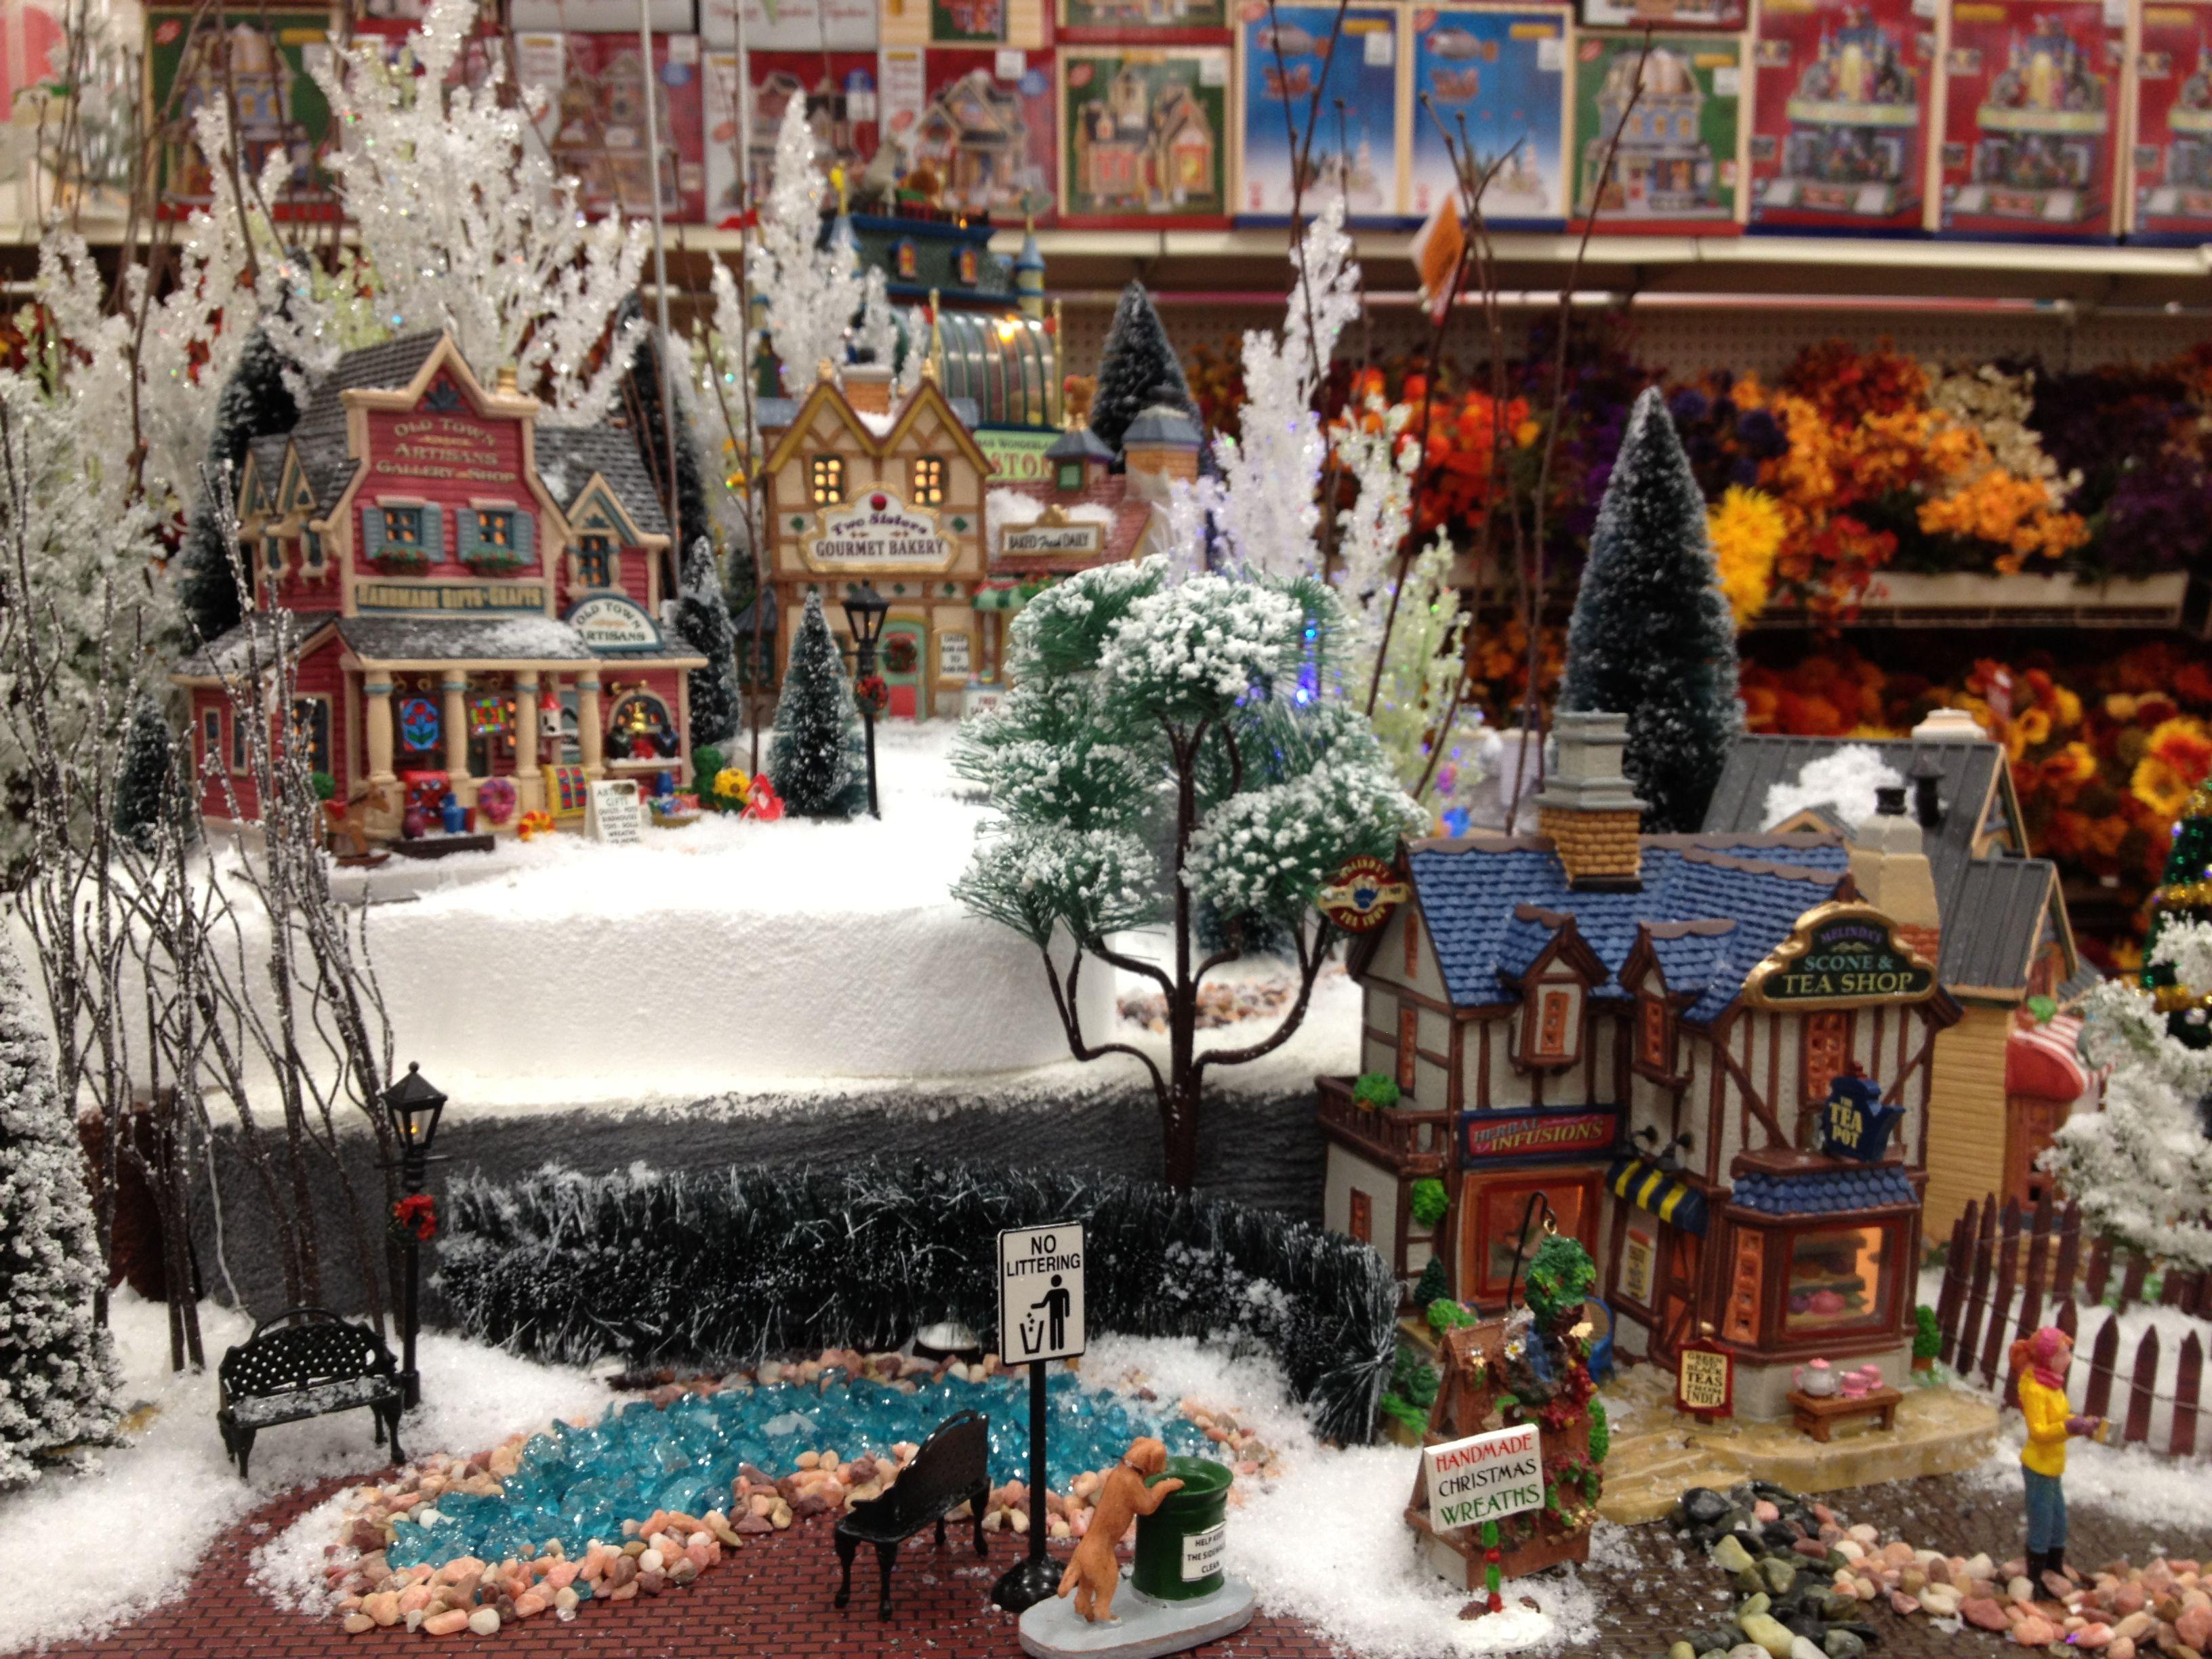 Christmas Lemax Display 2012 | Christmas Village Ideas ...